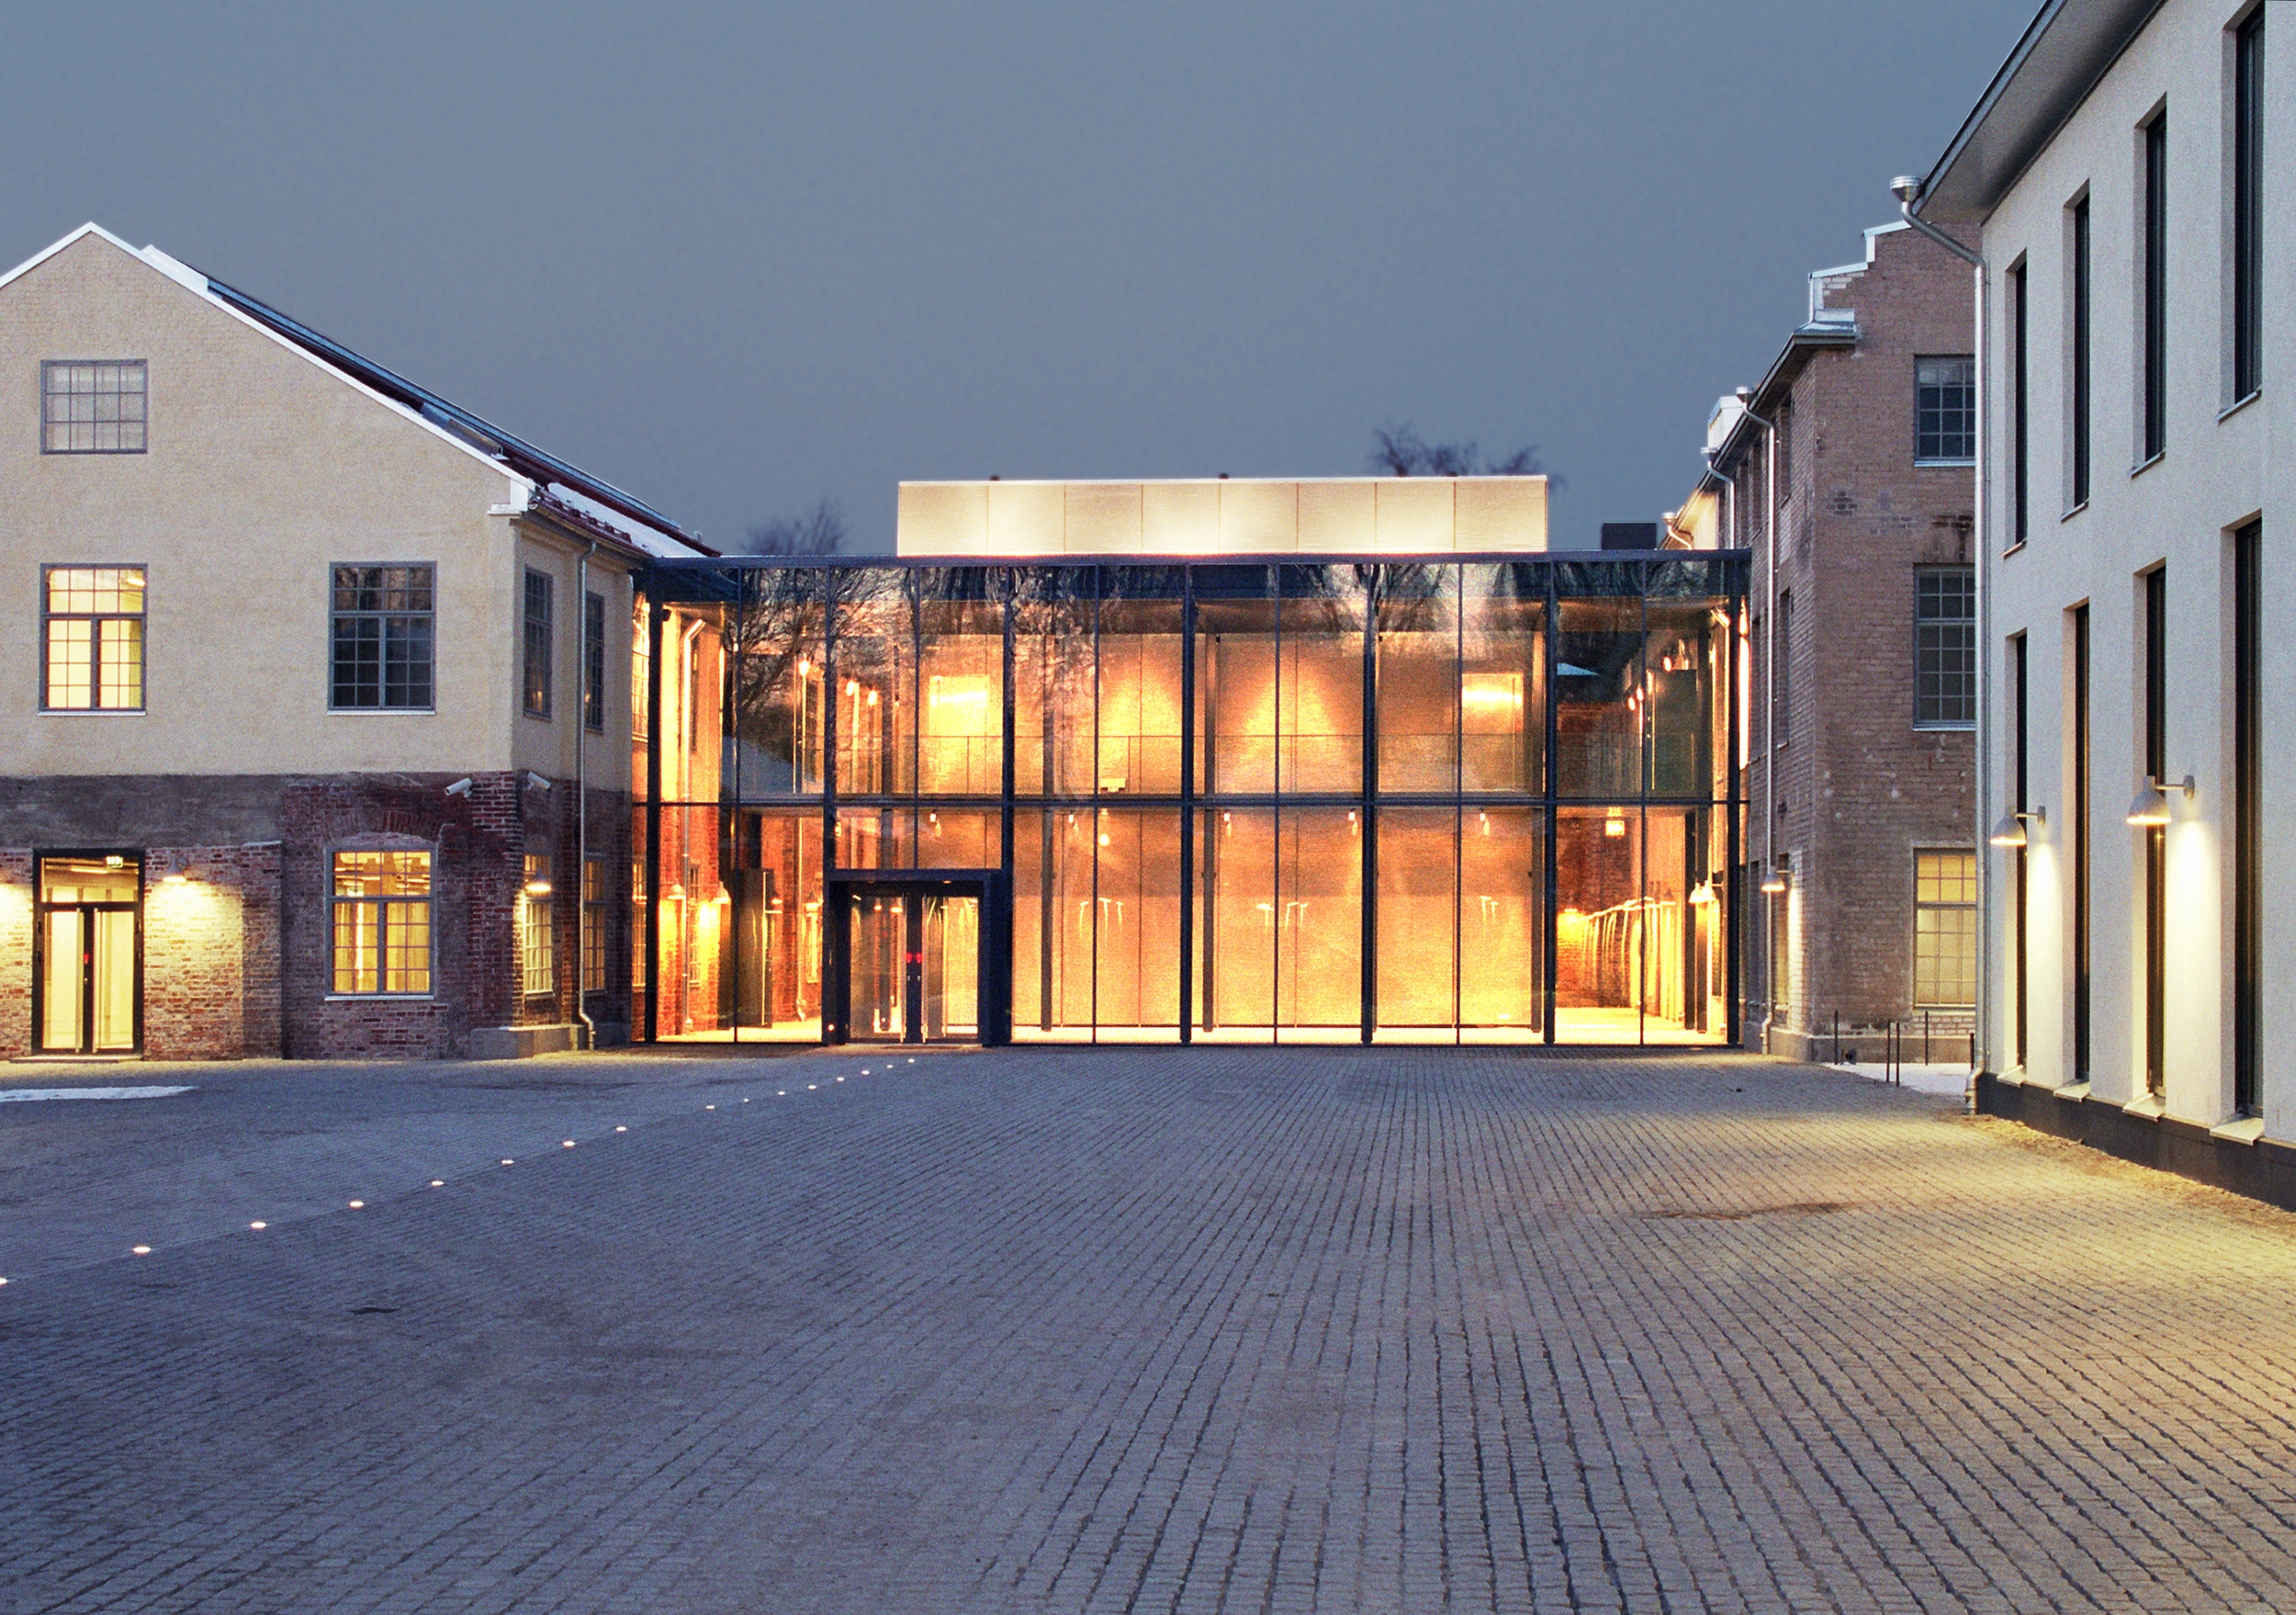 ARKEN, TURKU, FINLAND  Licensed by  ÅBO AKADEMI  UNIVERSITY